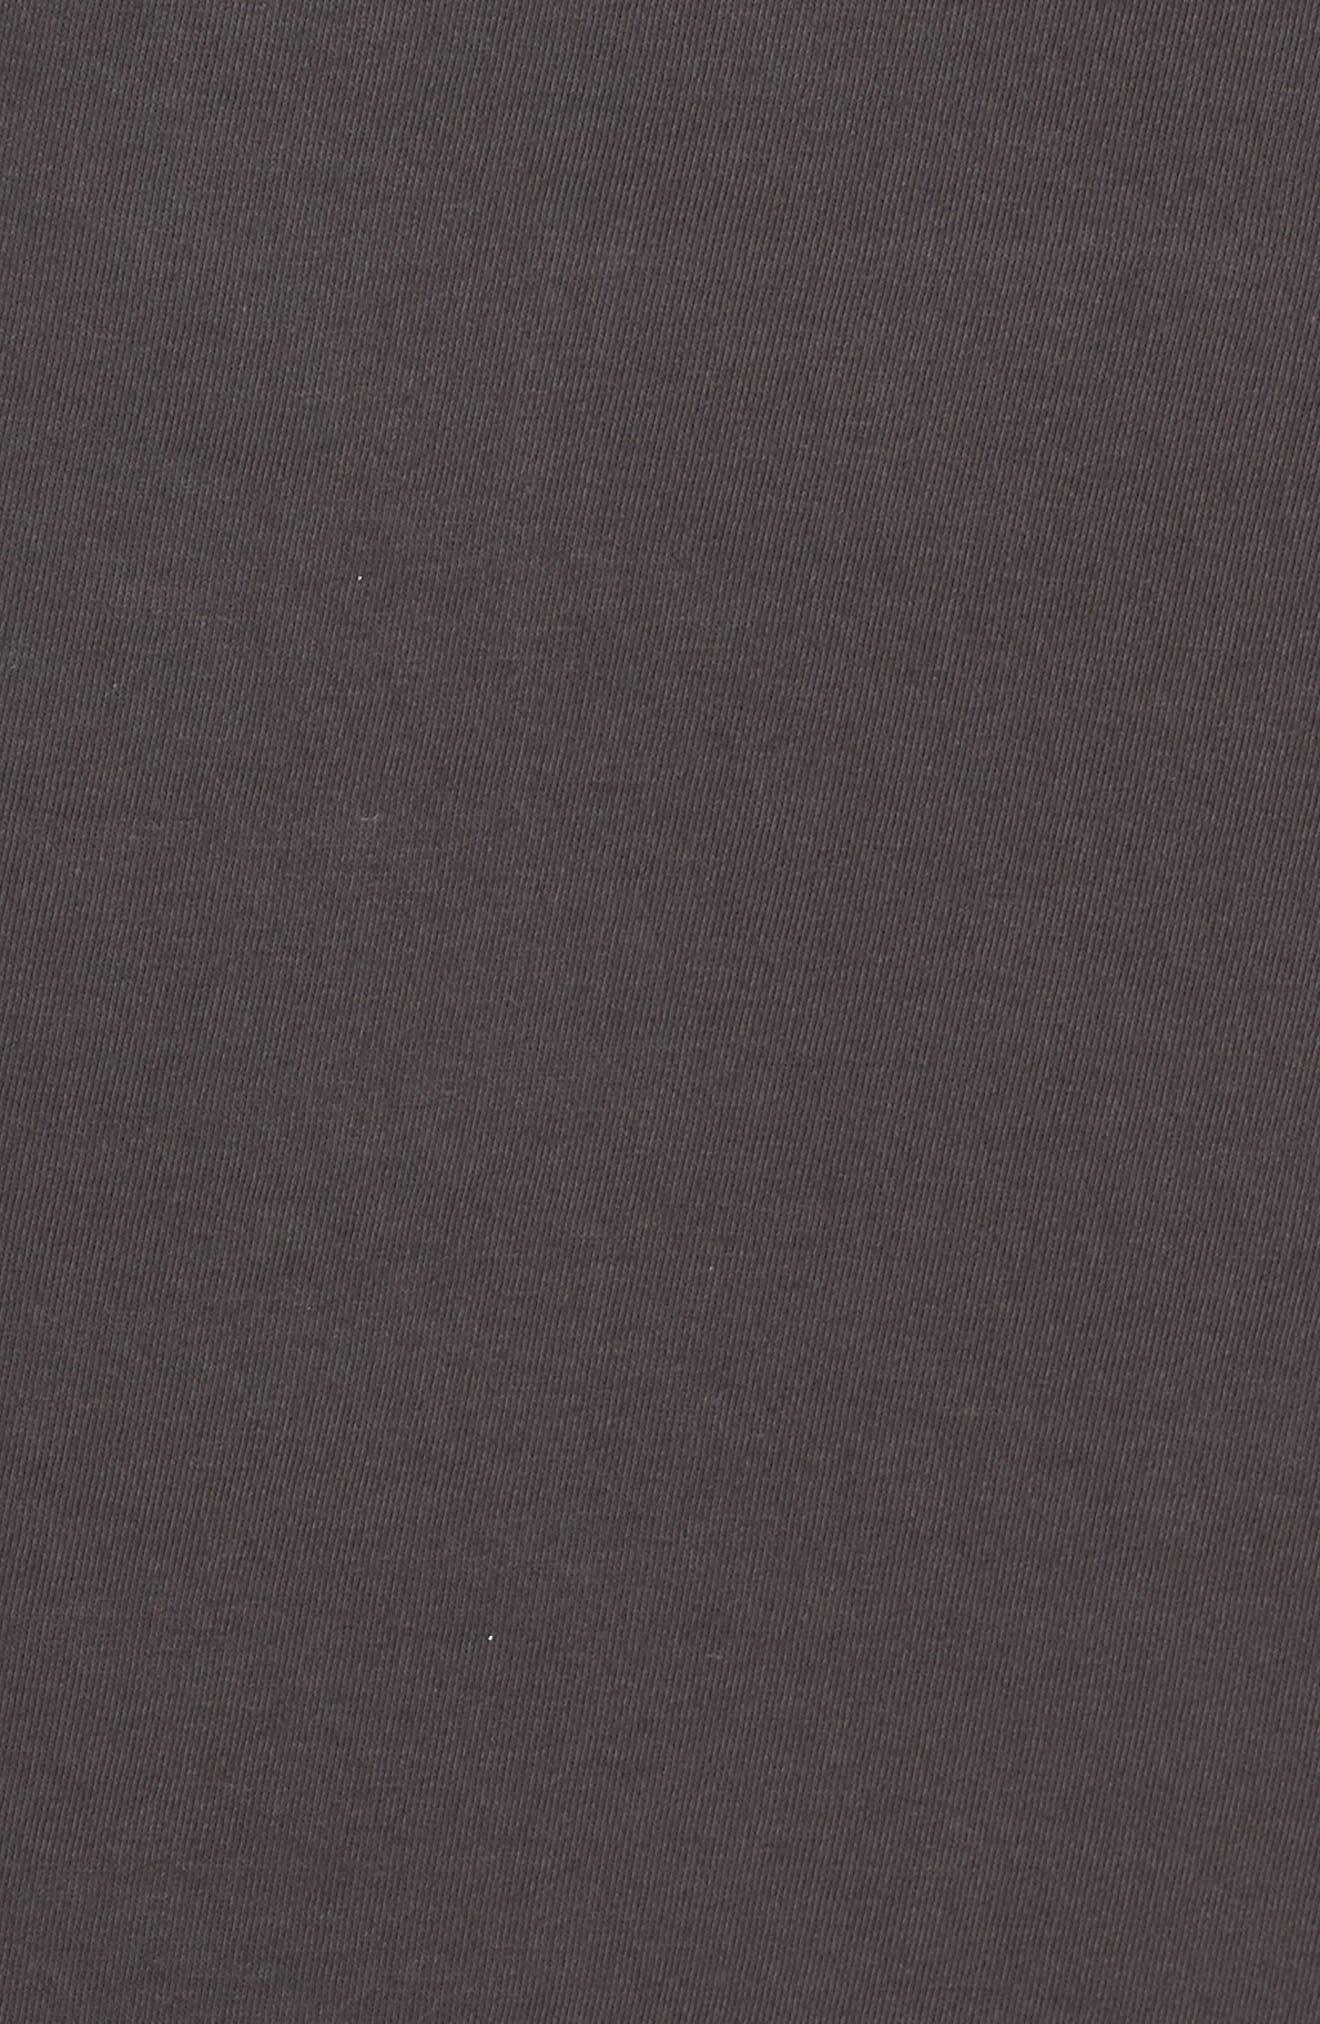 Willa Fleece Short Robe,                             Alternate thumbnail 10, color,